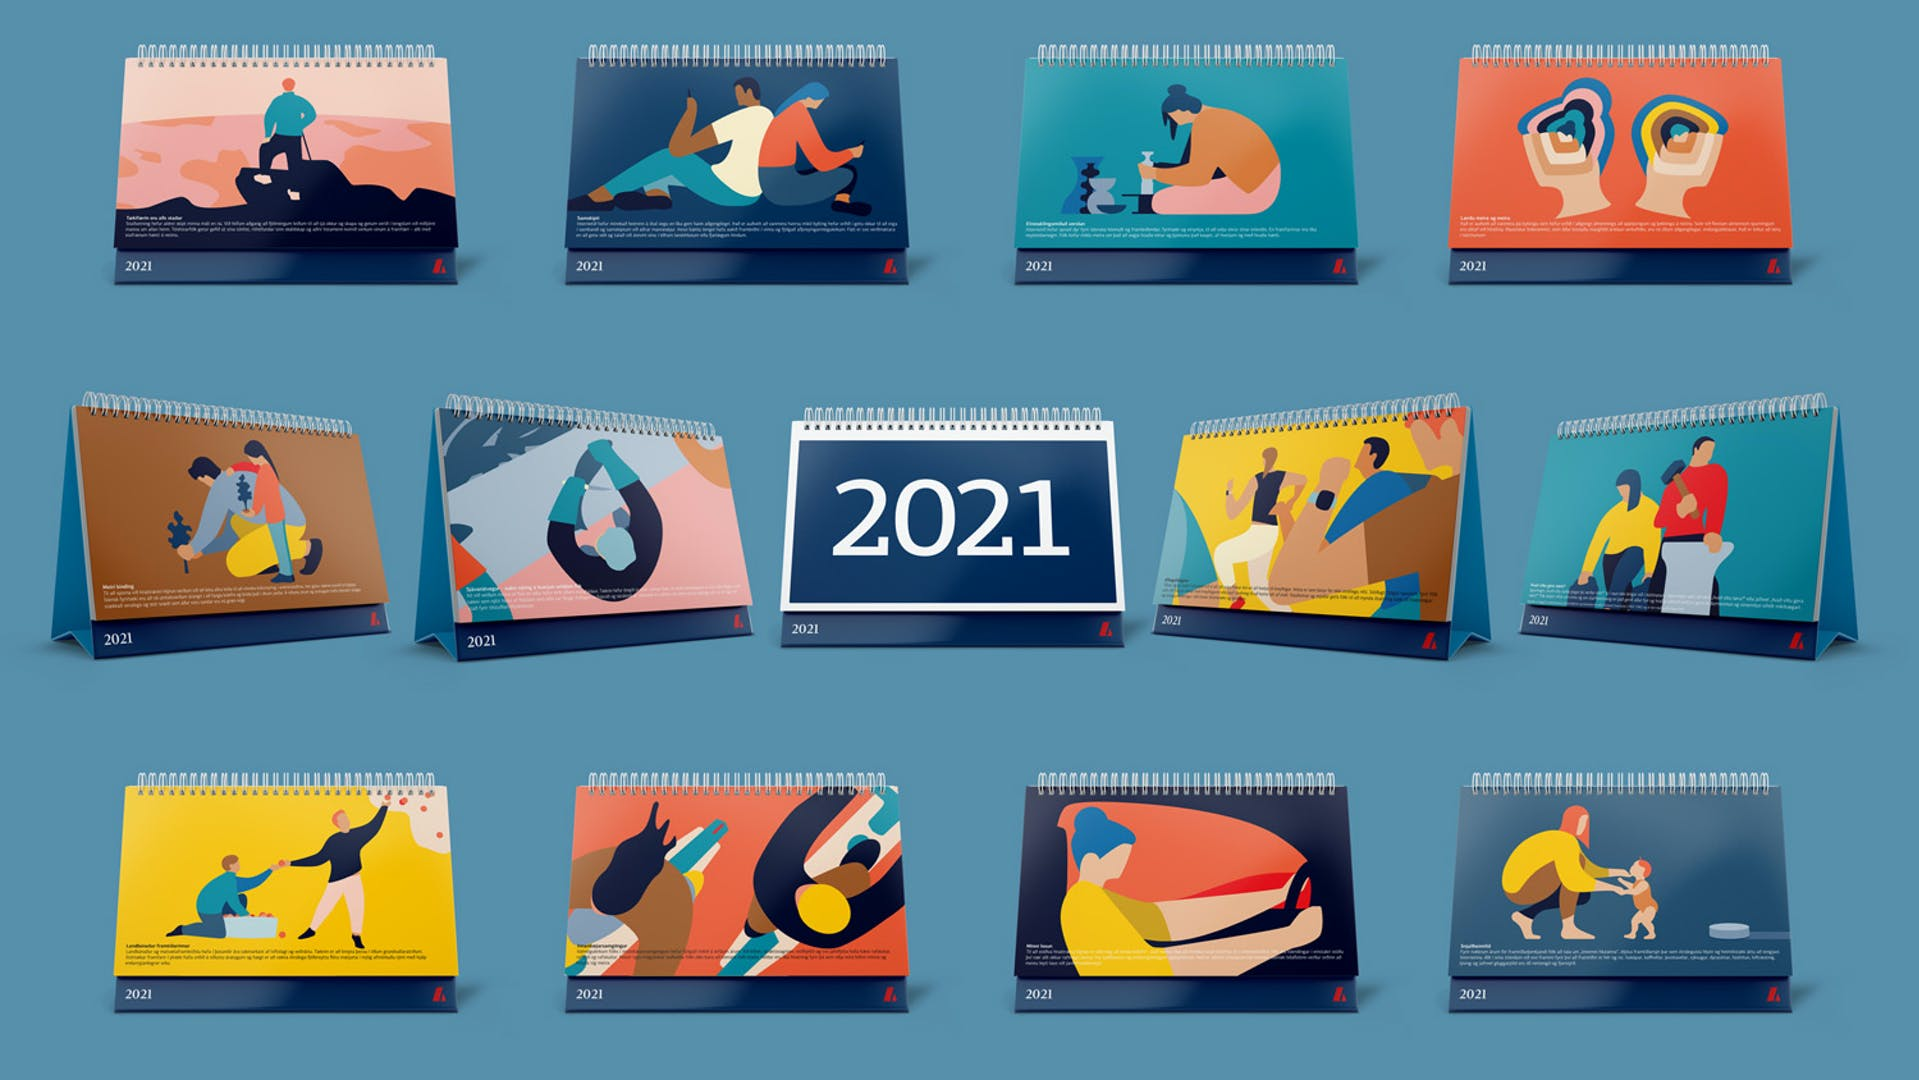 Dagatal Landsbankans 2021